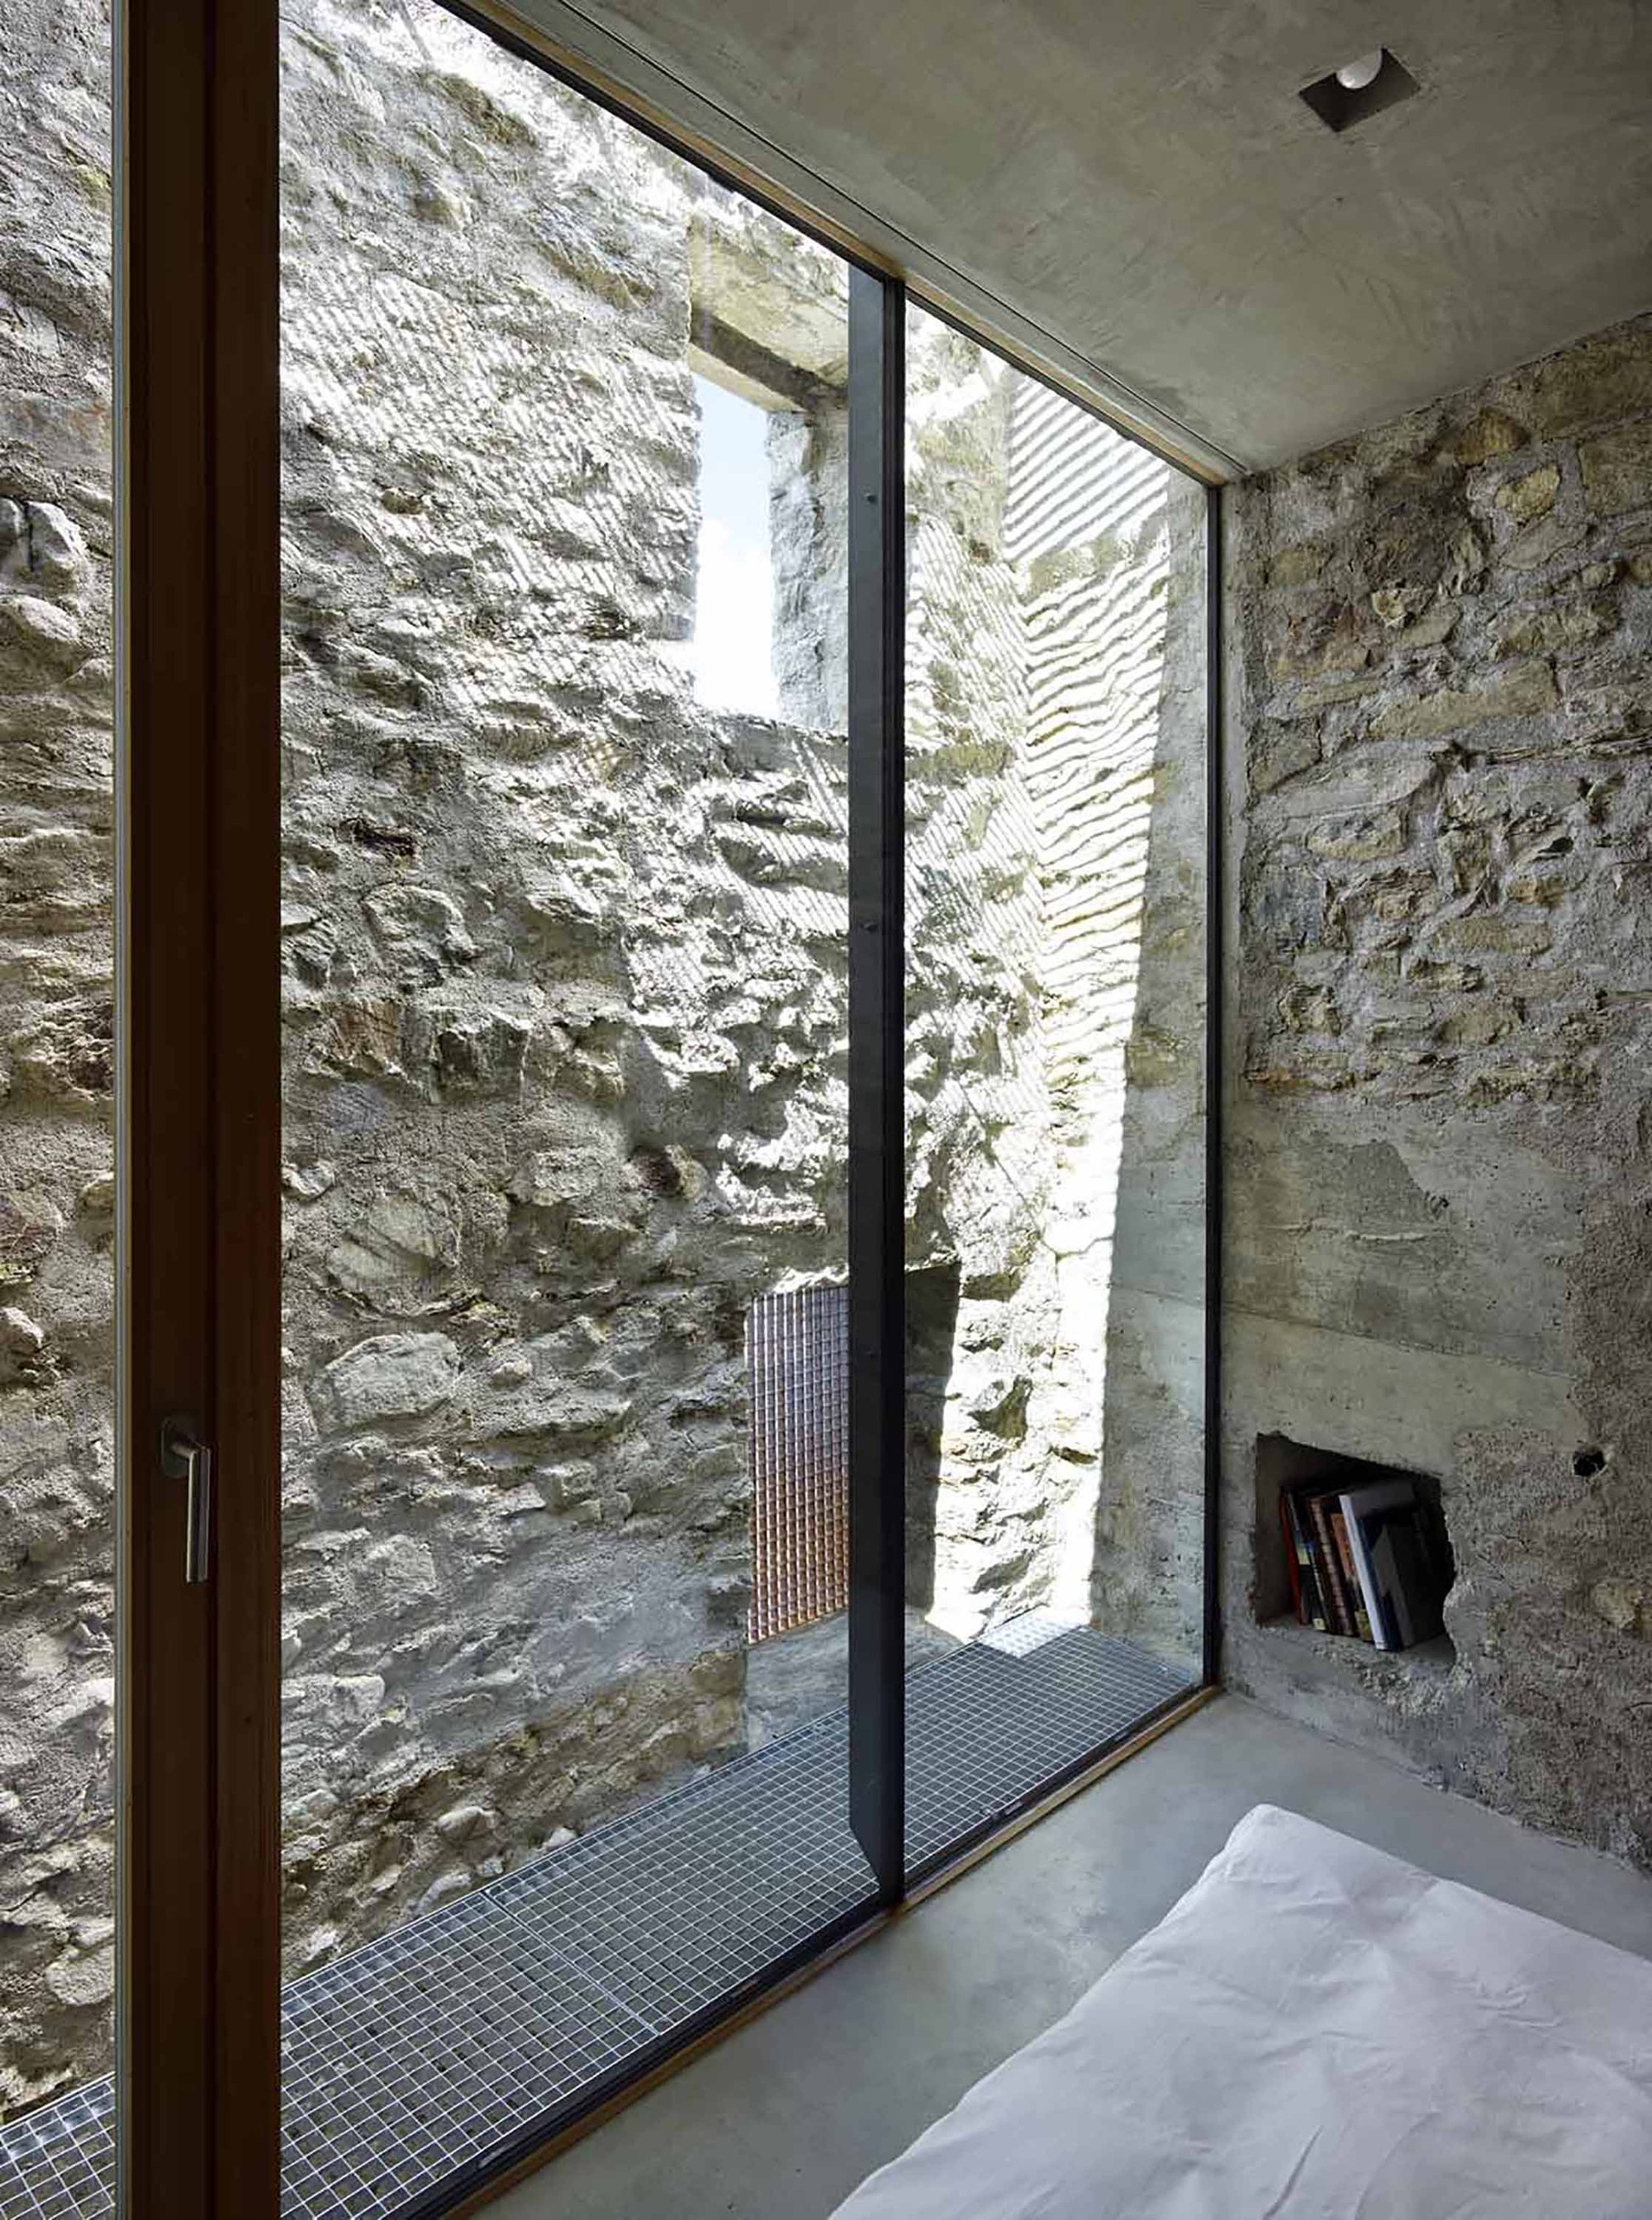 543dd5a6c07a80762d00024b_stone-house-transformation-in-scaiano-wespi-de-meuron-romeo-architects_1430_cf030063.jpg